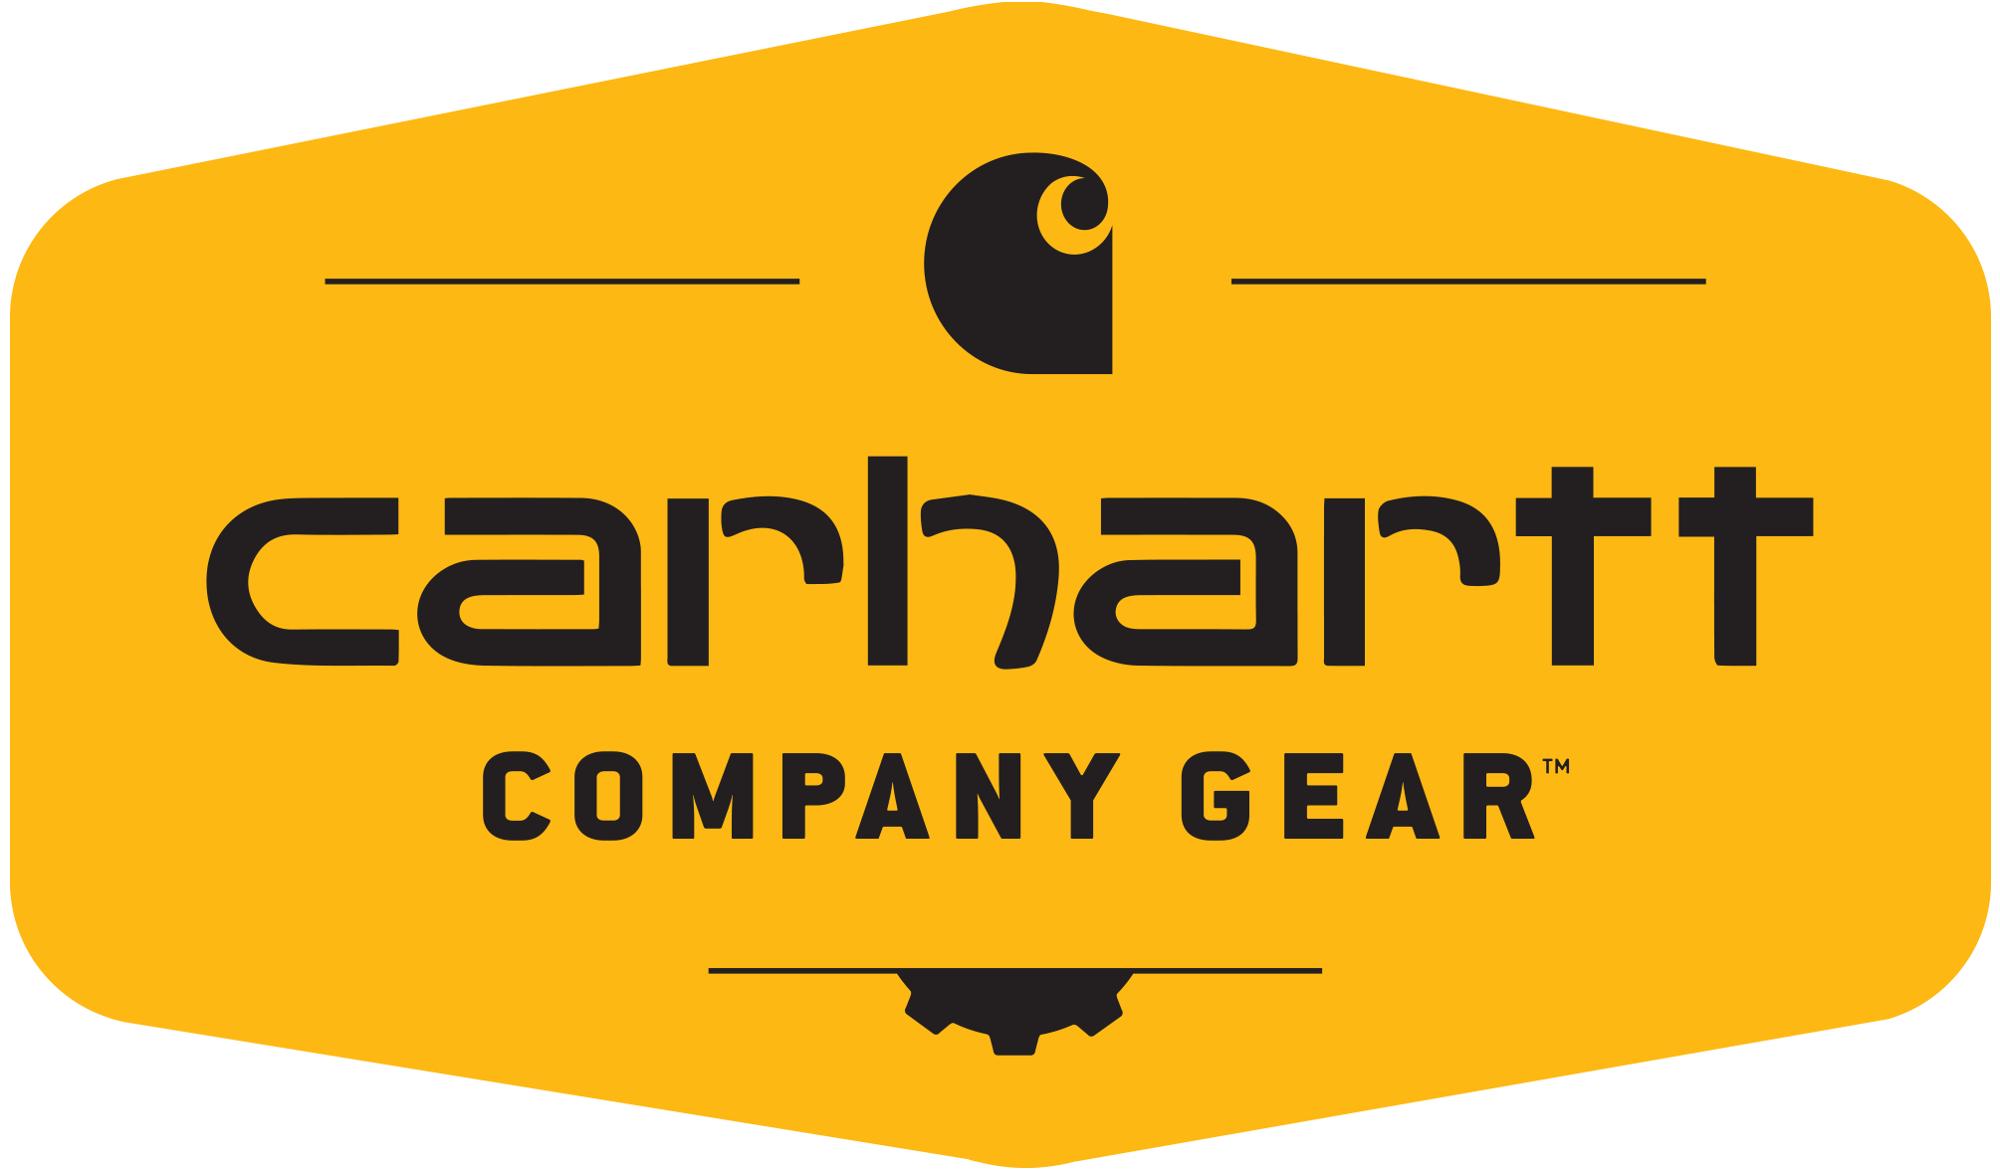 Carhartt_logo_2000px_crop2.jpg